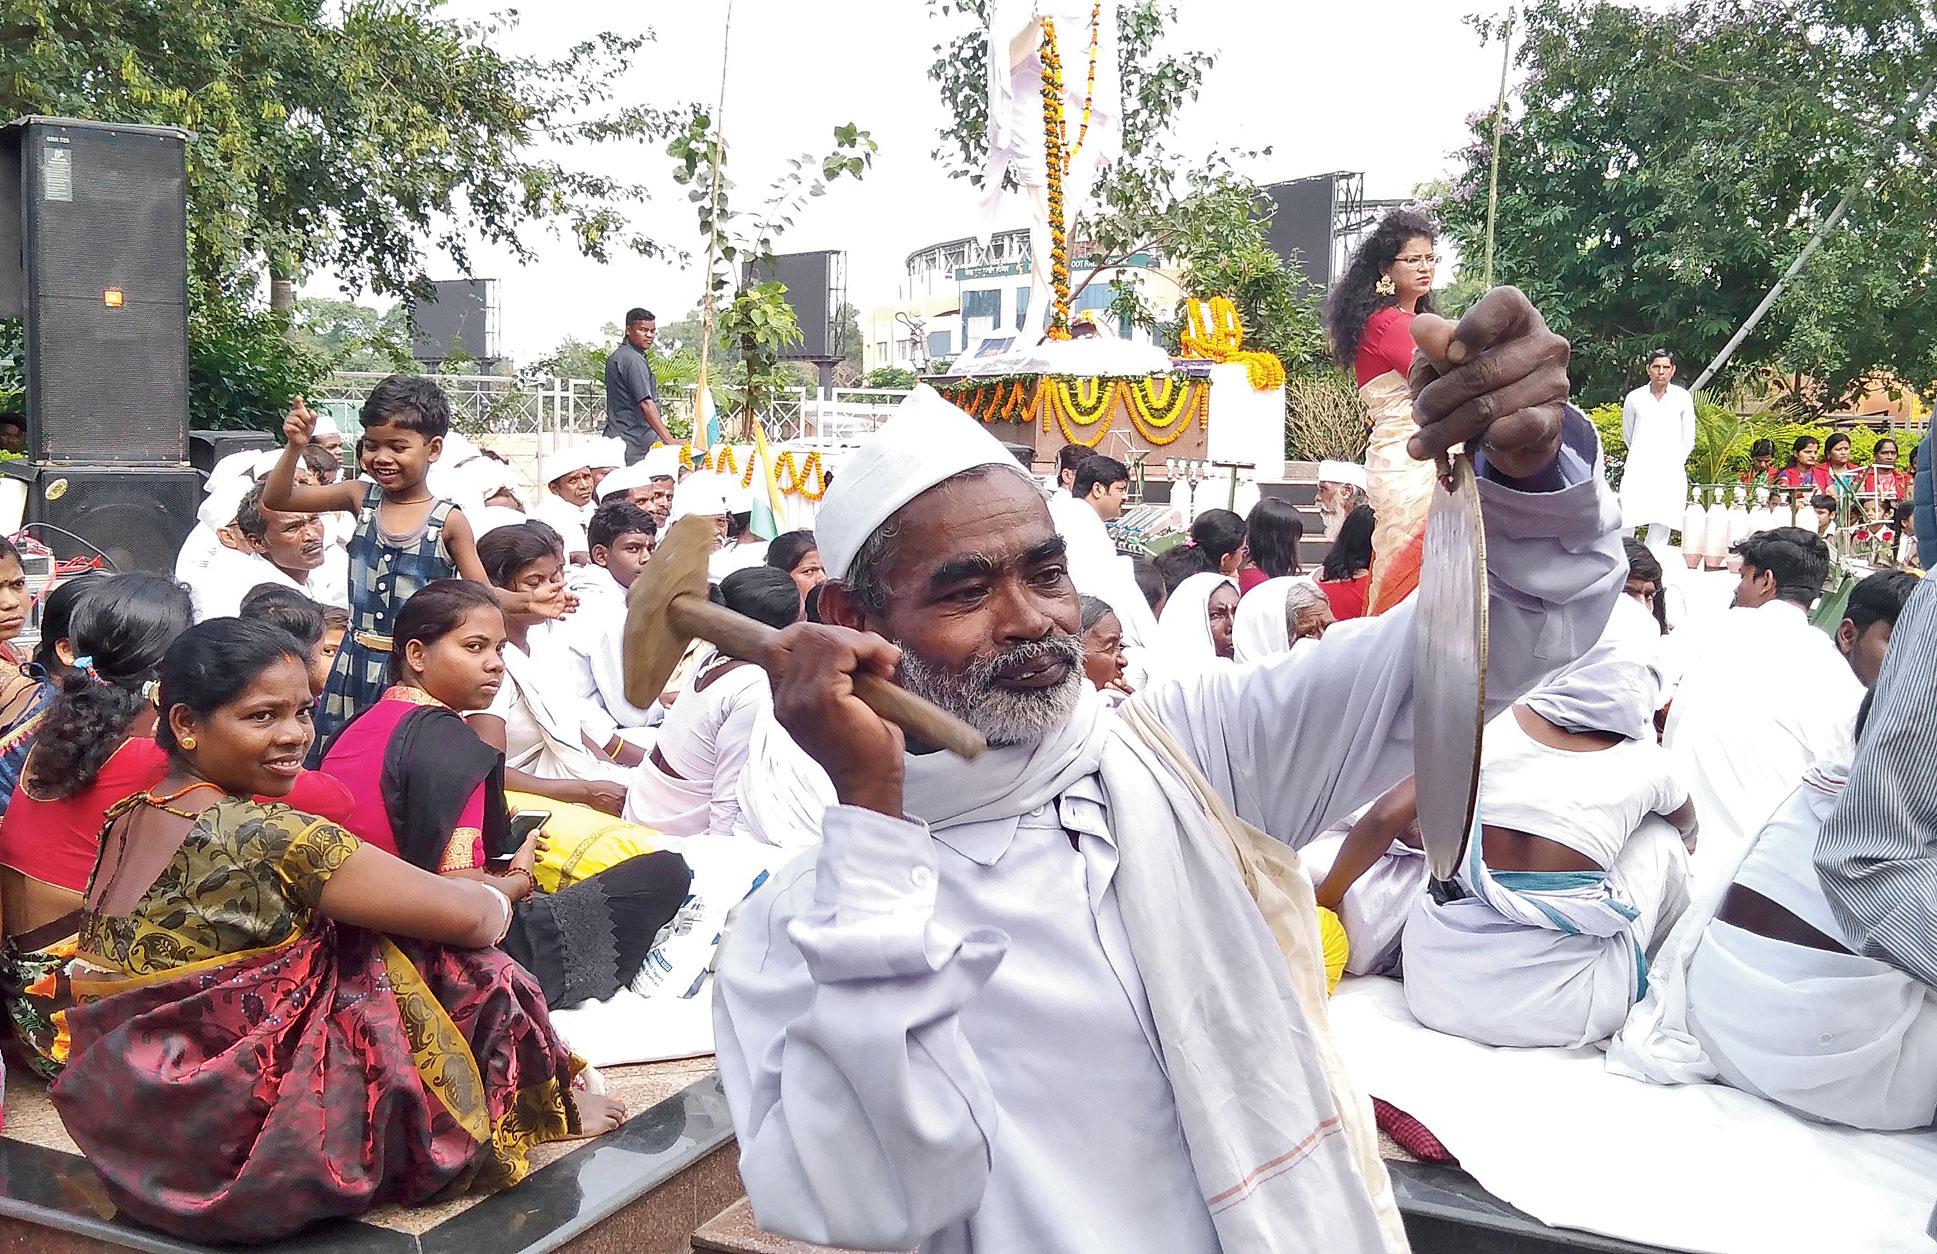 Tana Bhagats at a rally to mark Gandhiji's 150th birth anniversary at Bapu Vatika in Morabadi, Ranchi, on Wednesday.